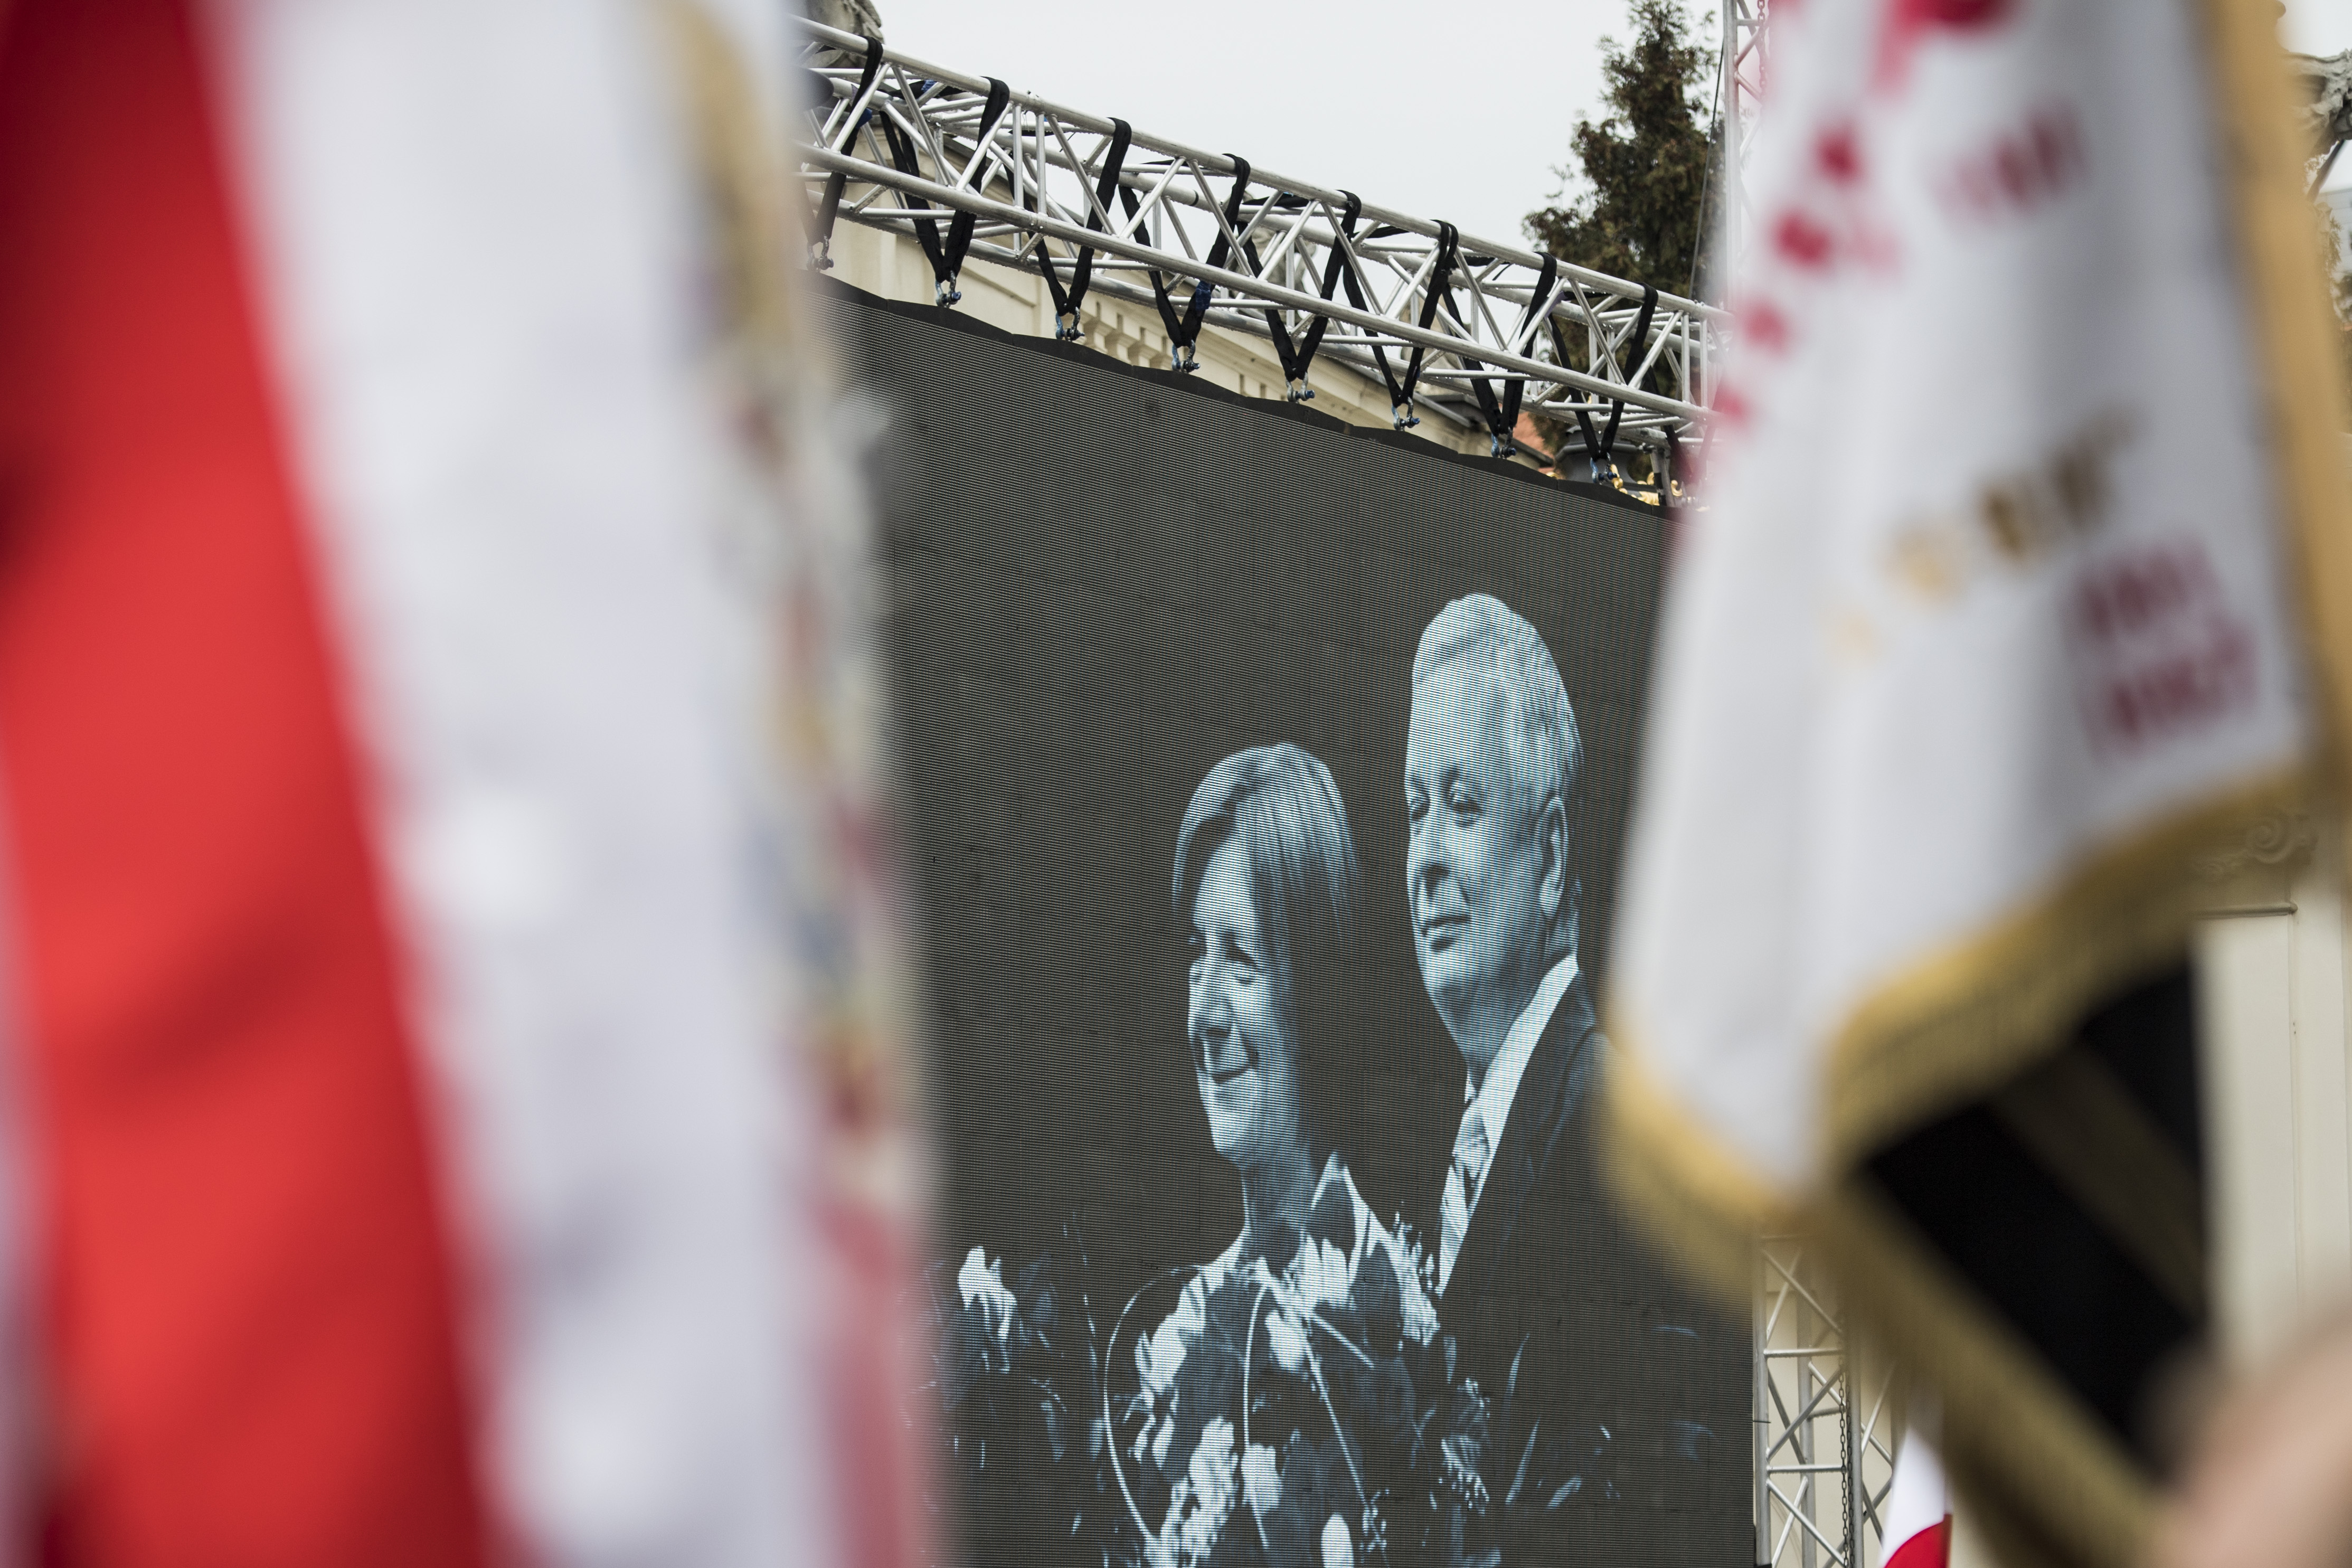 Lech Kaczyński, Prezydent RP i Maria Kaczyńska, Małżonka Prezydenta RP